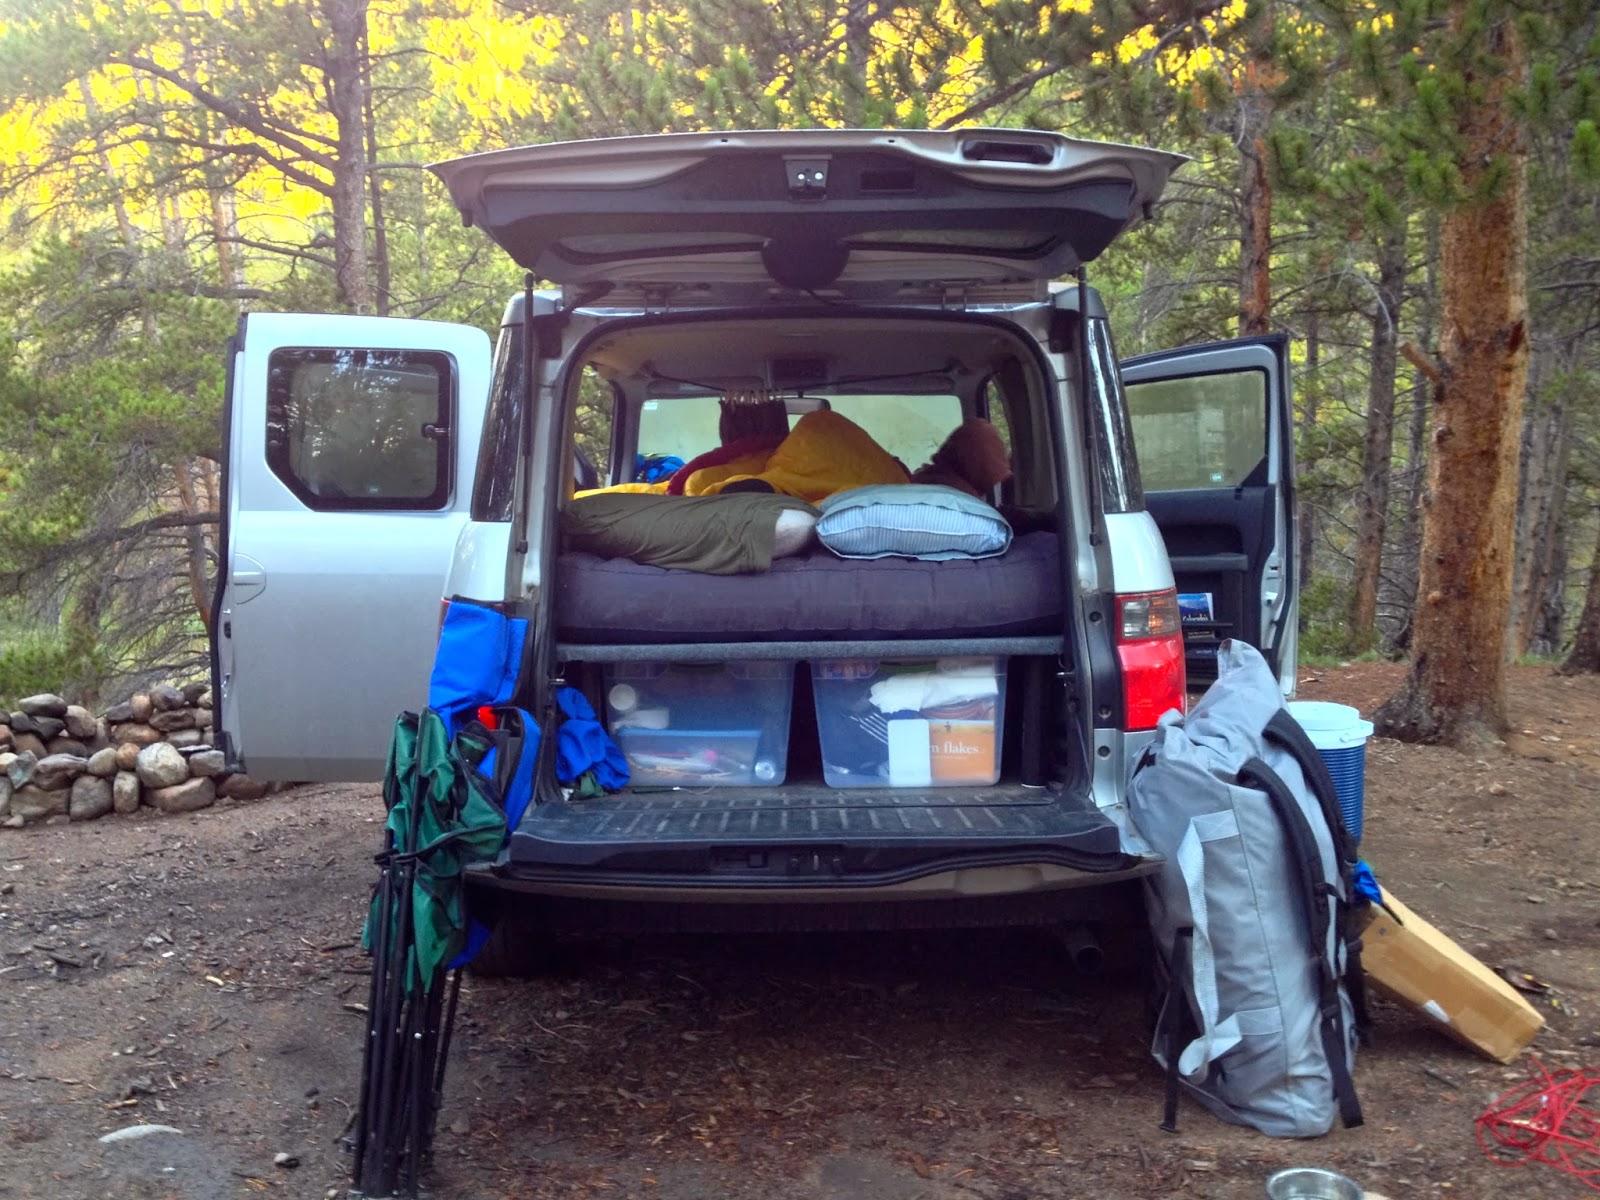 colorado adventures honda element camperplatform